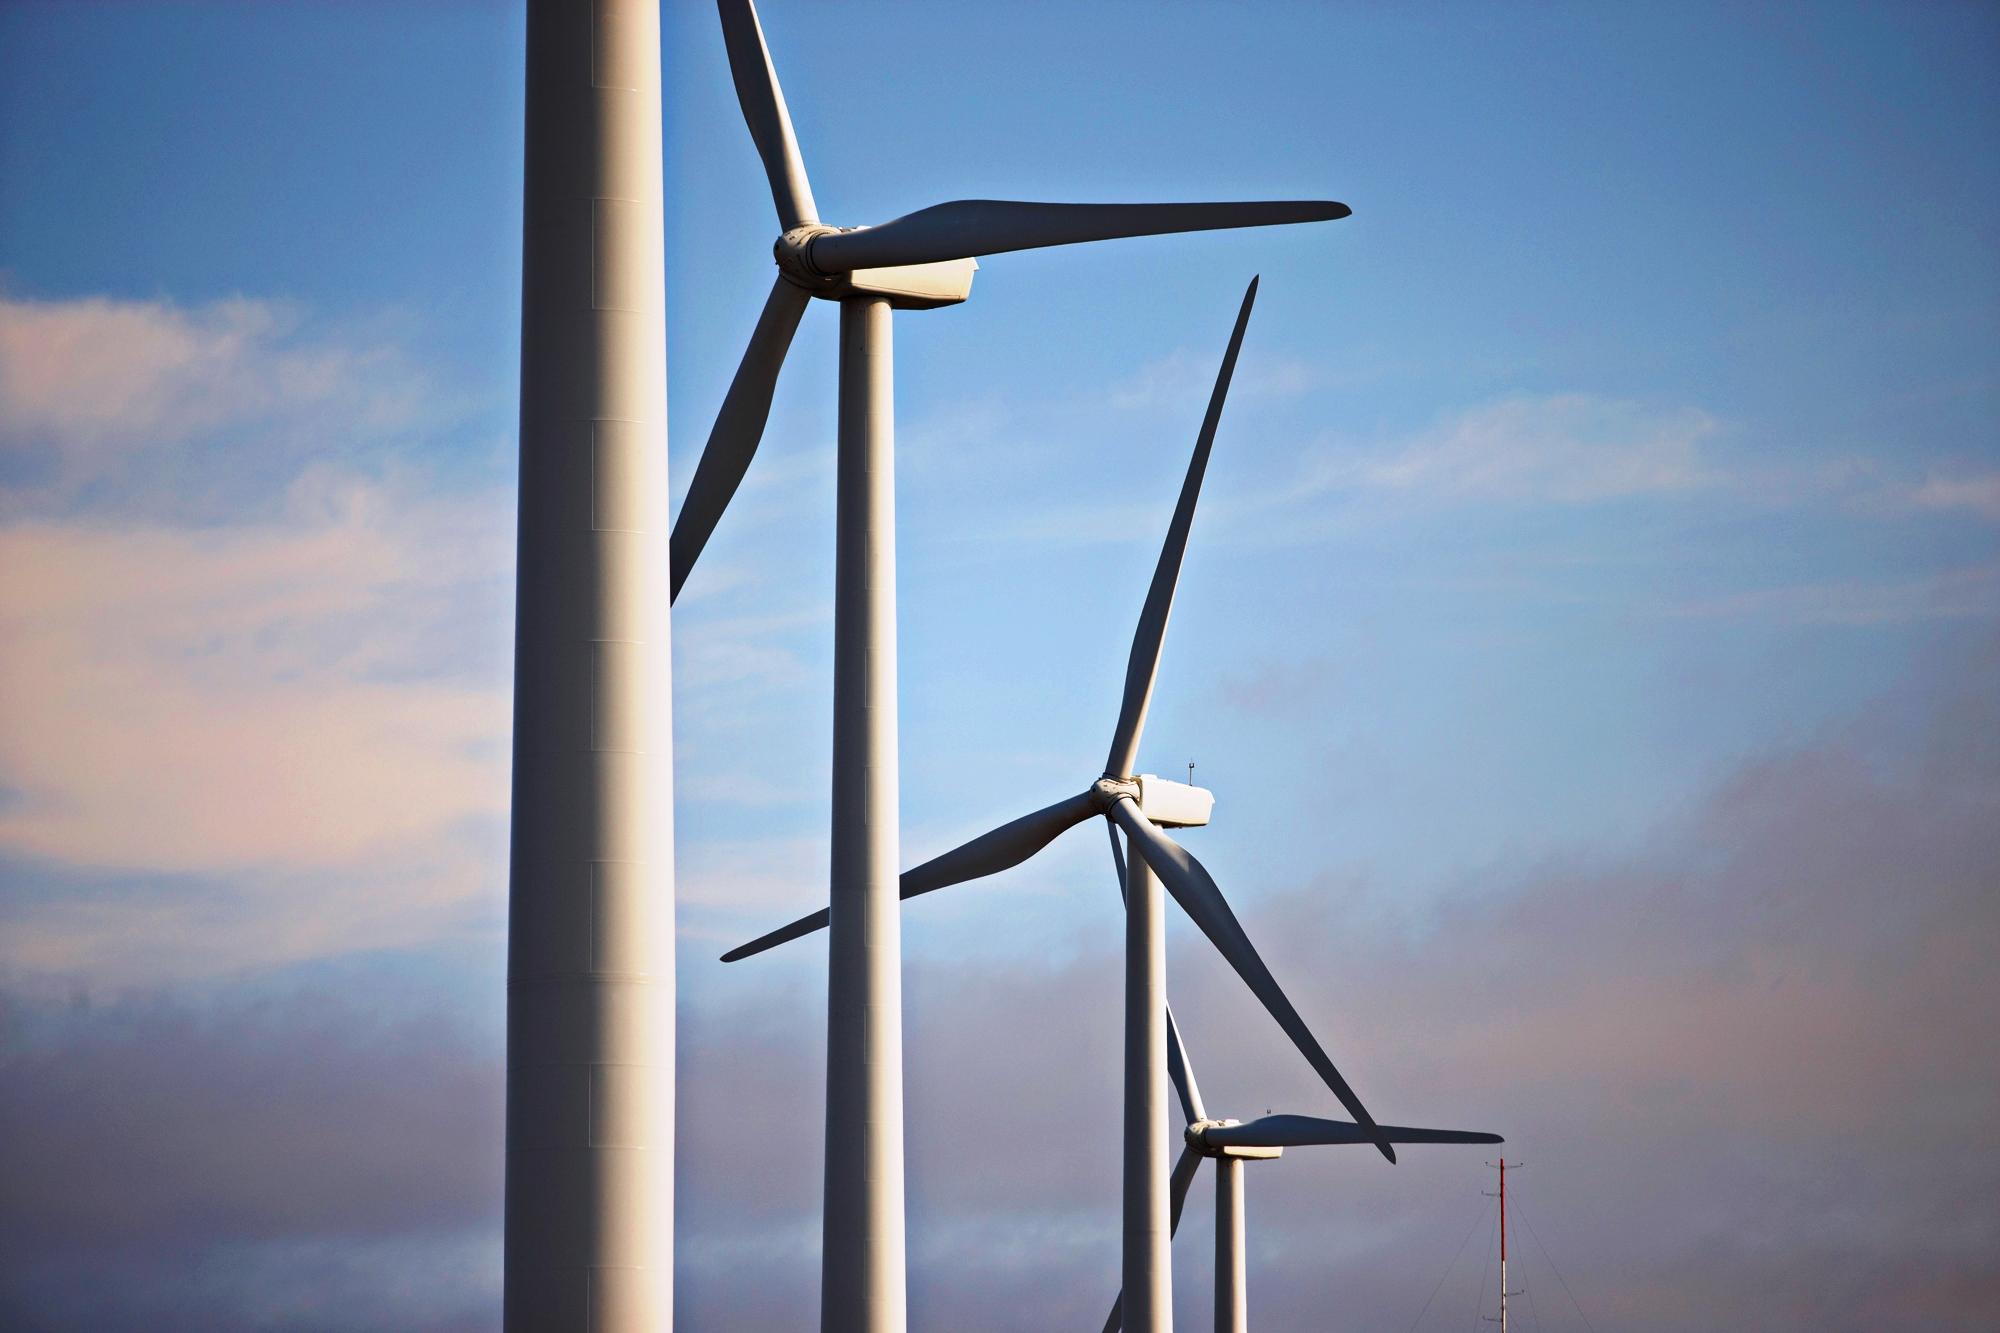 Wind mills in Digby Neck